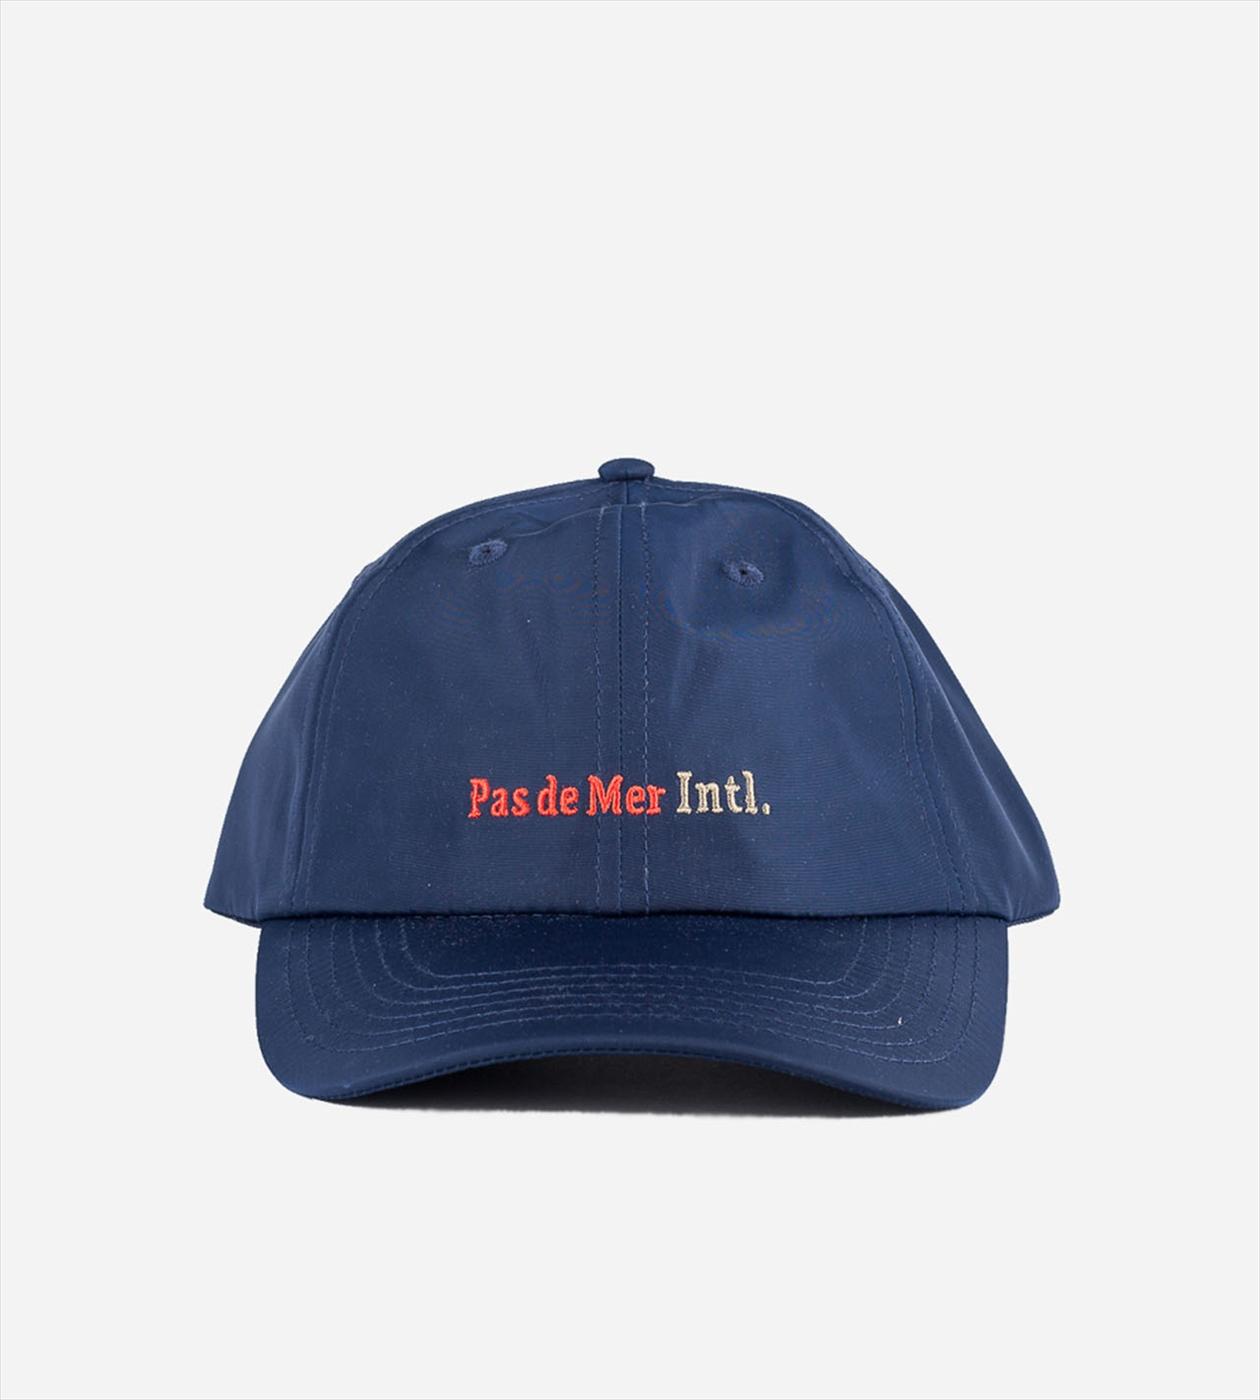 【PAS DE MER/パドゥメ】TECHNO CAP キャップ / BLUE